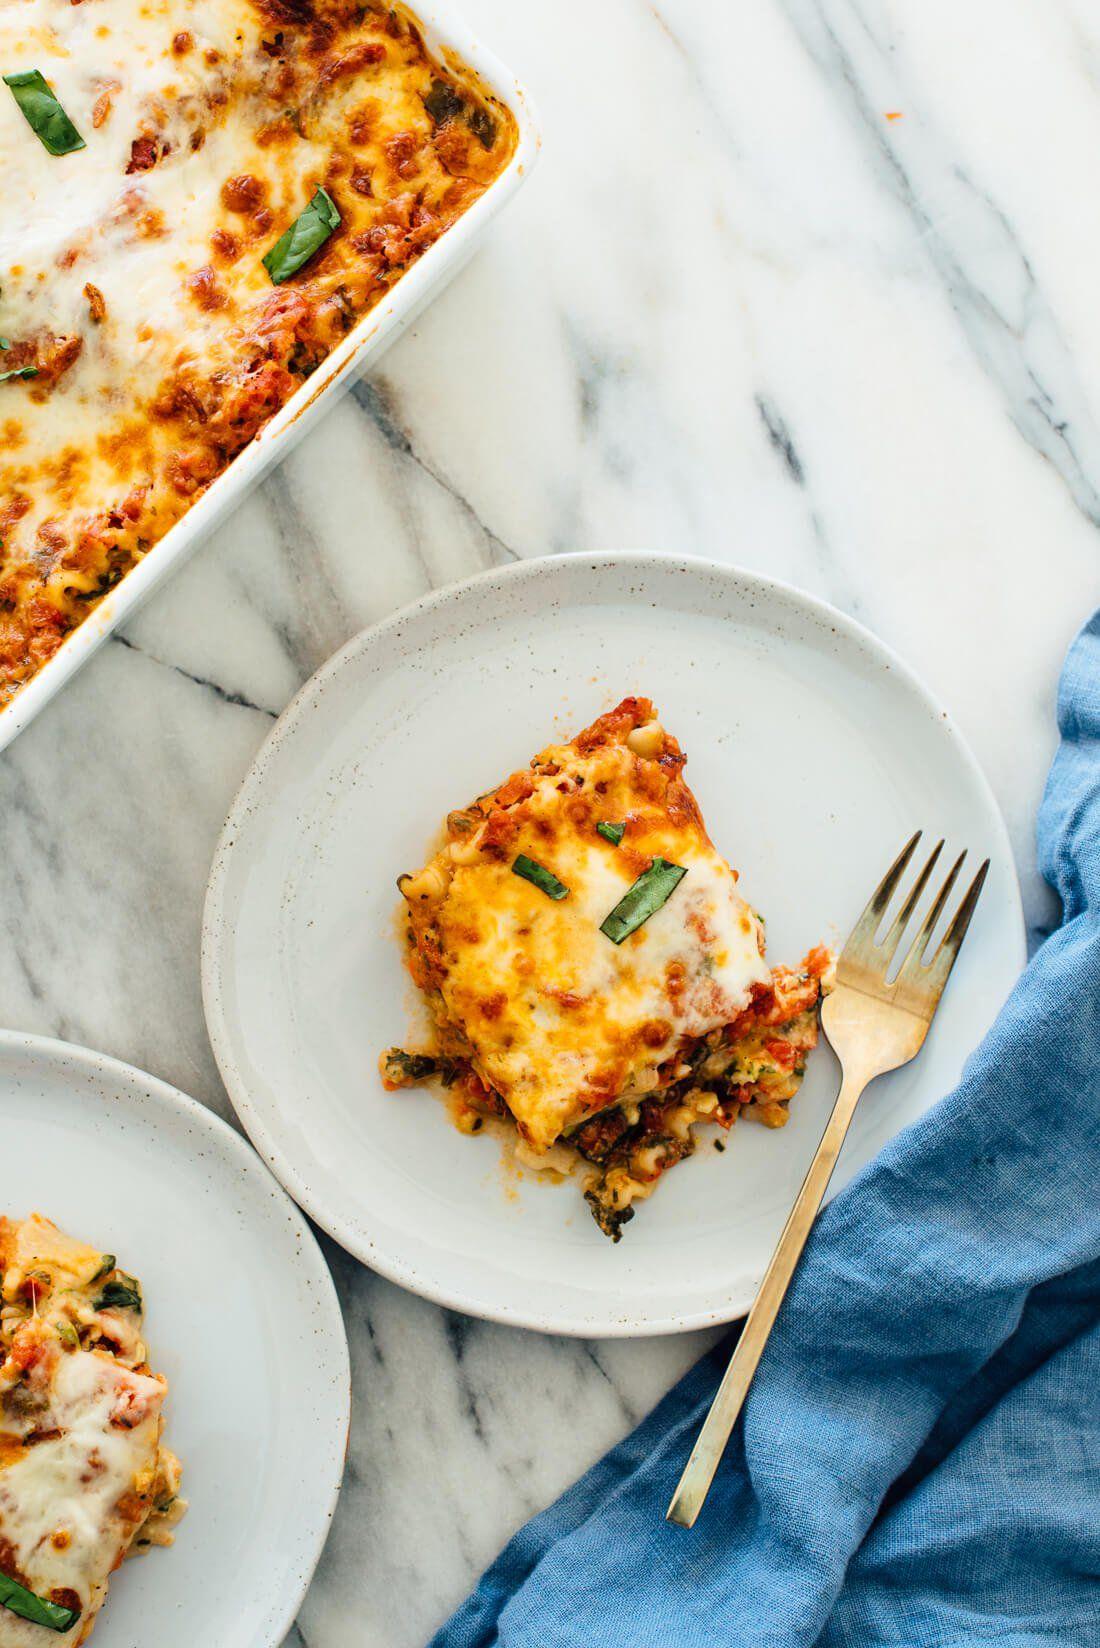 Best Vegetable Lasagna Recipe Cookie And Kate Recipe Vegetable Lasagna Recipes Vegetable Lasagna Lasagna Recipe